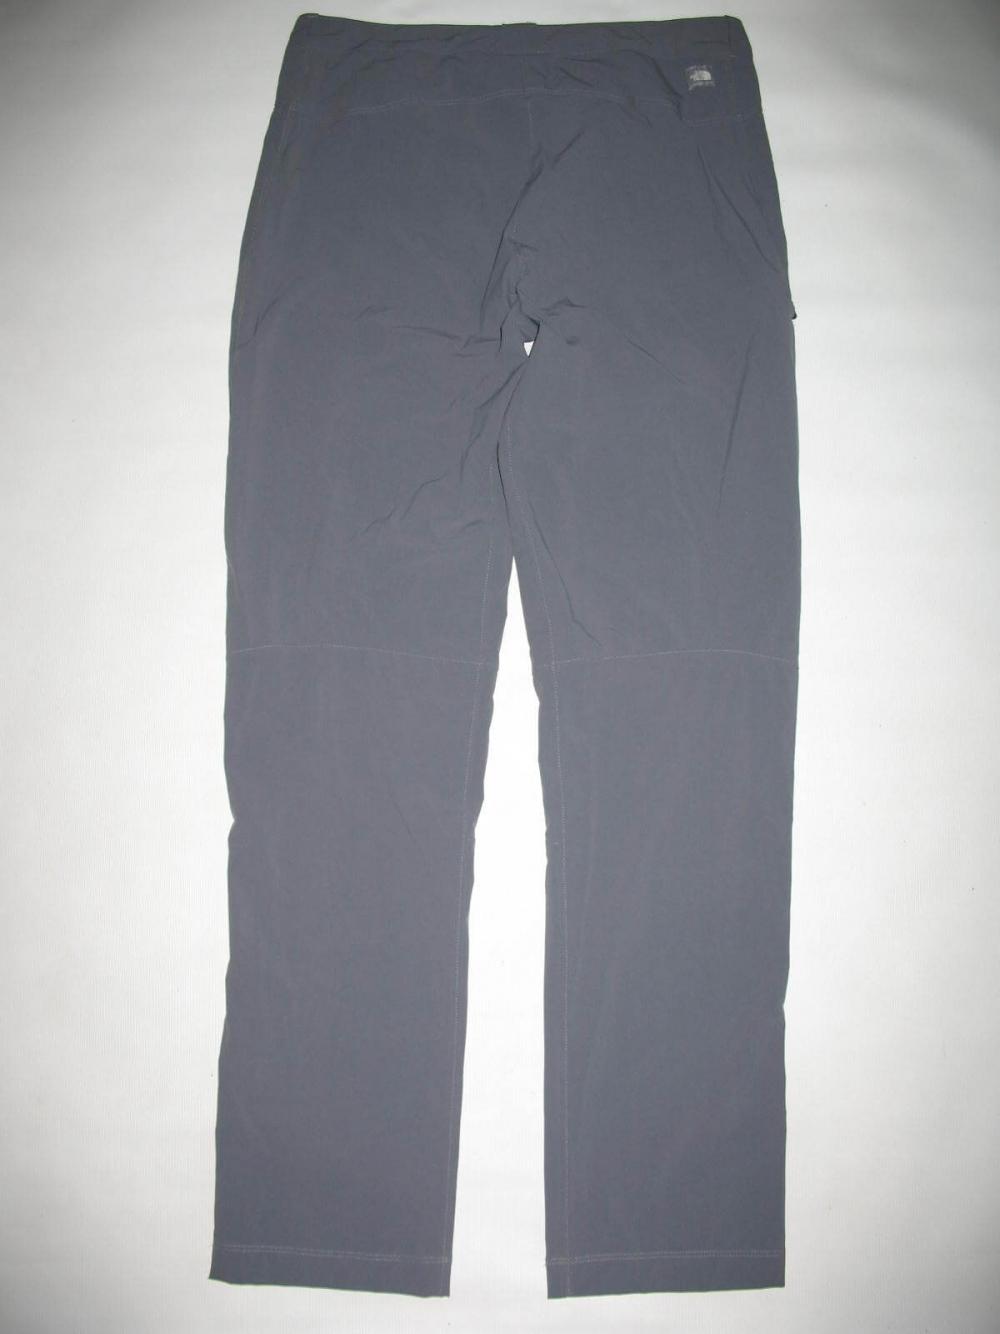 THE NORTH FACE trekking pants lady/unisex (размер 8/M) - 1